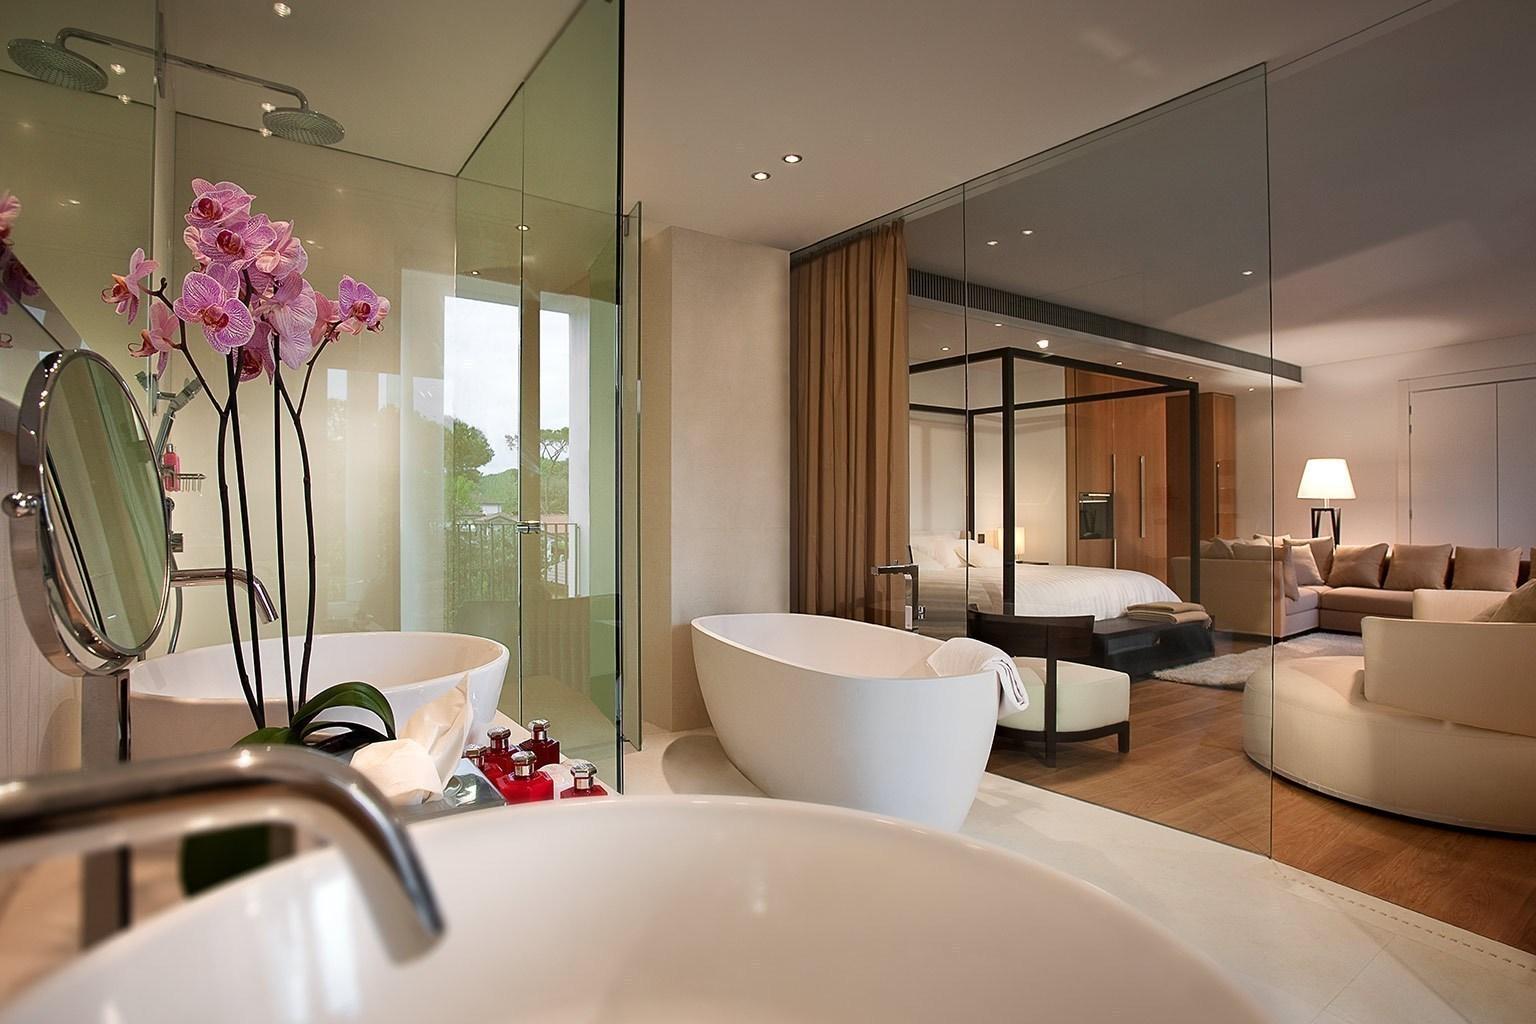 hotel principe forte dei marmi | luxushotels bei designreisen